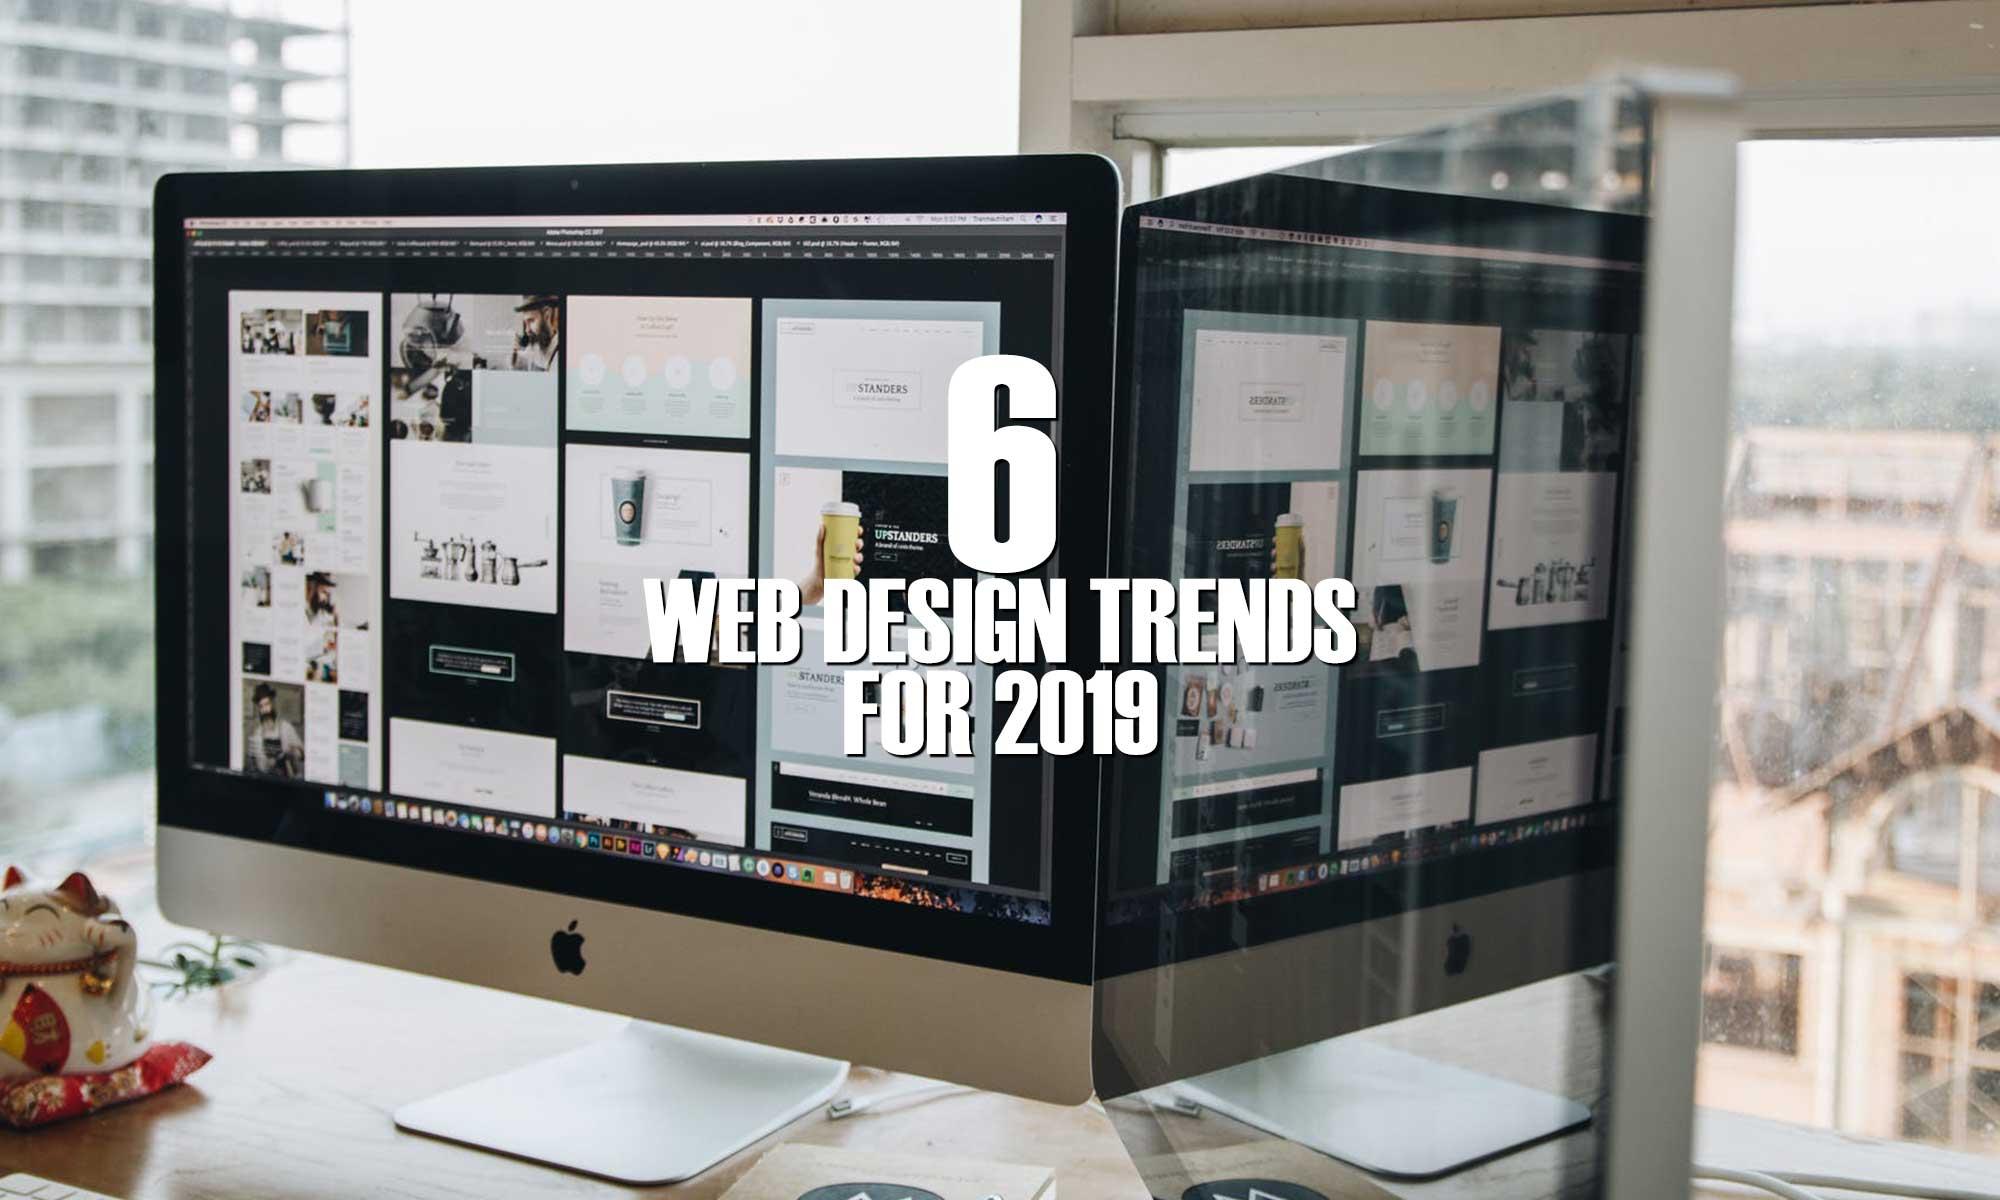 1marketingidea-website-design-trends-for-2019